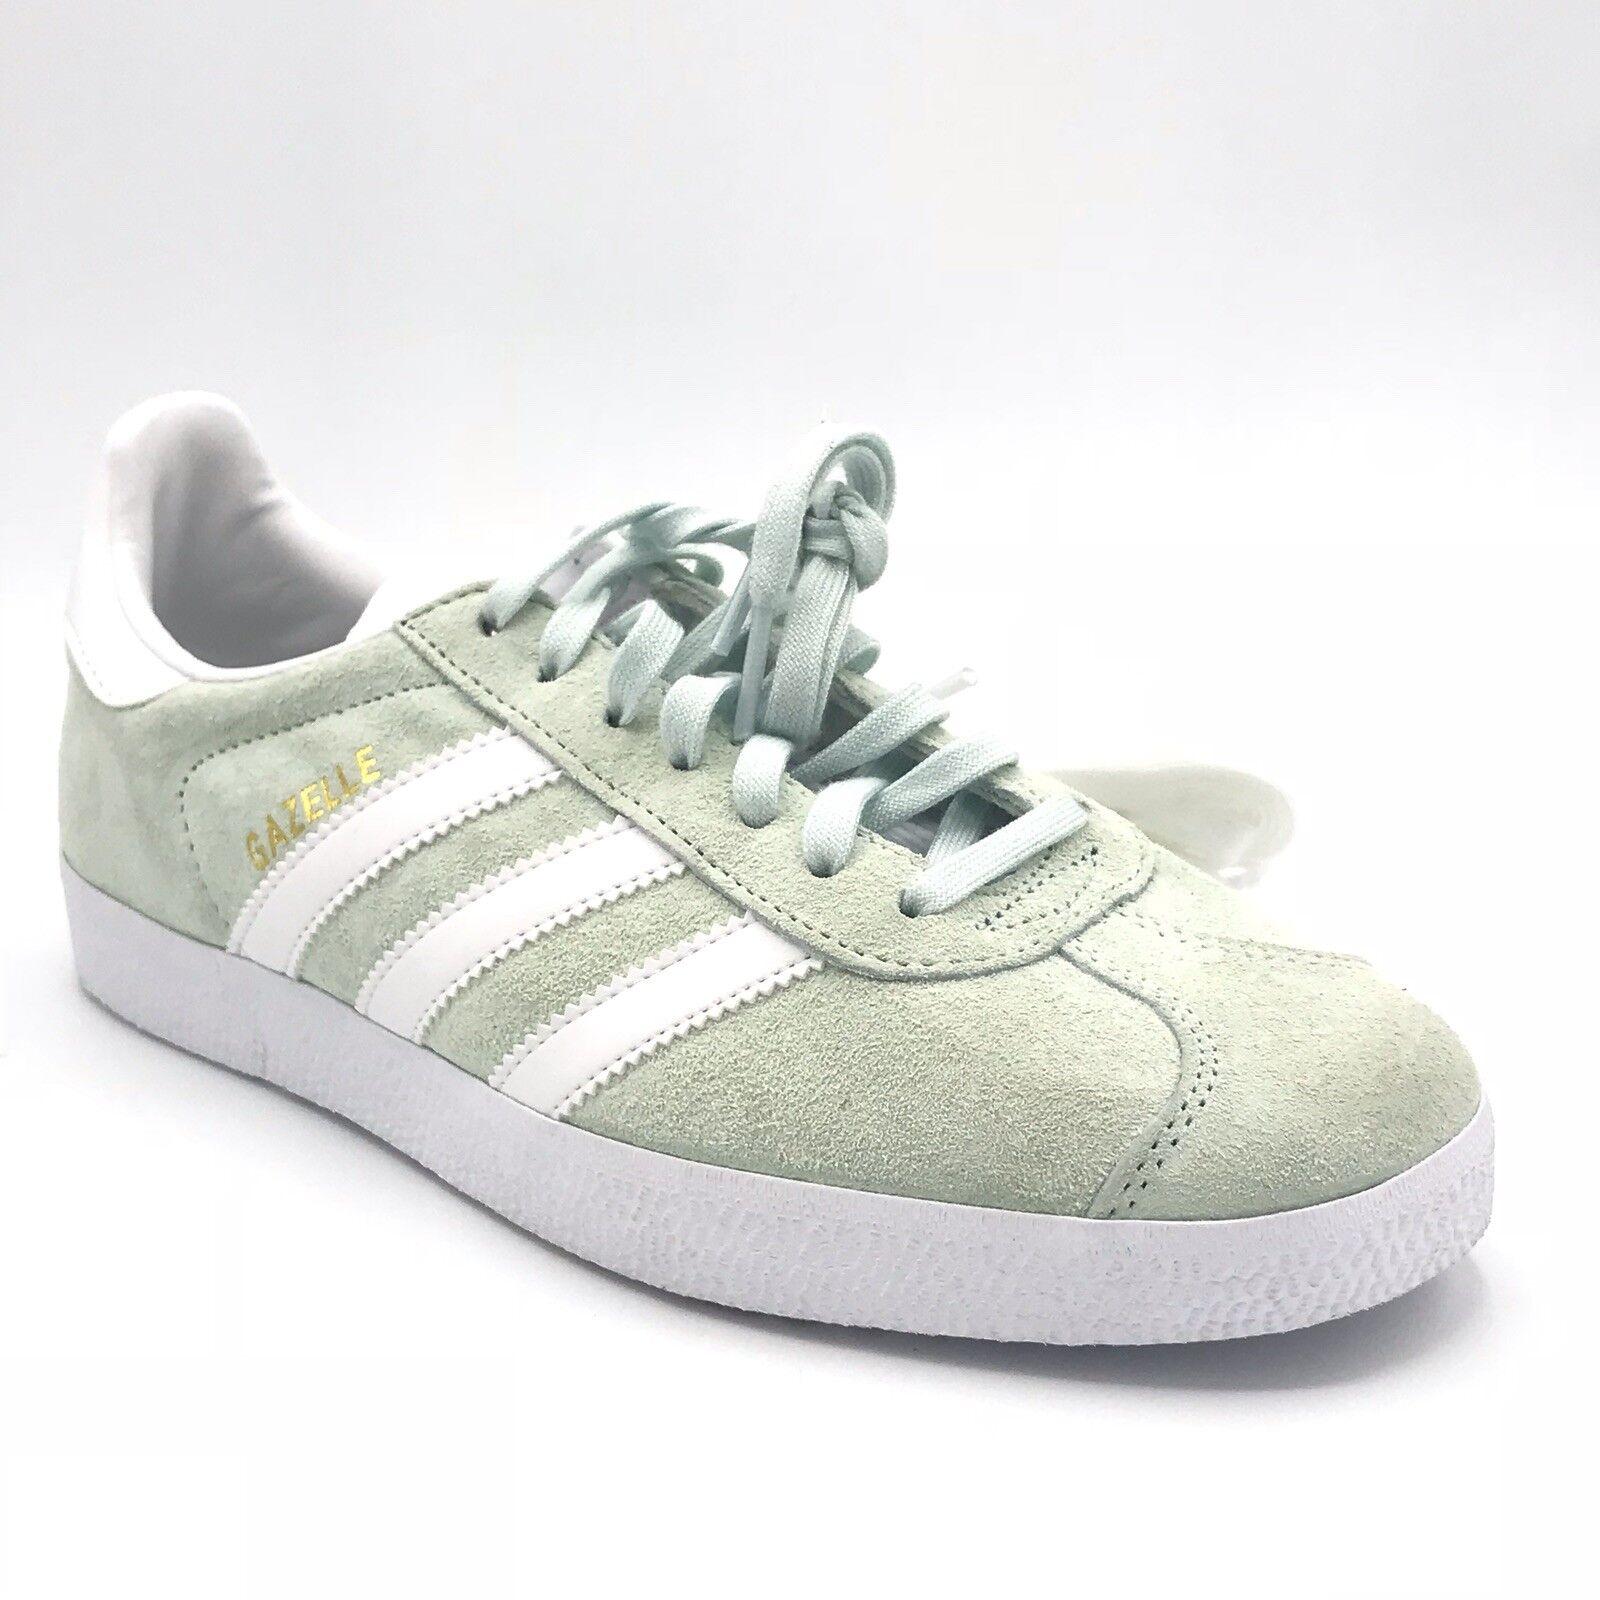 4fed2864cc191 Adidas Originals Originals Originals Gazelle Ice Mint Green Women s shoes  BA9599 c79092